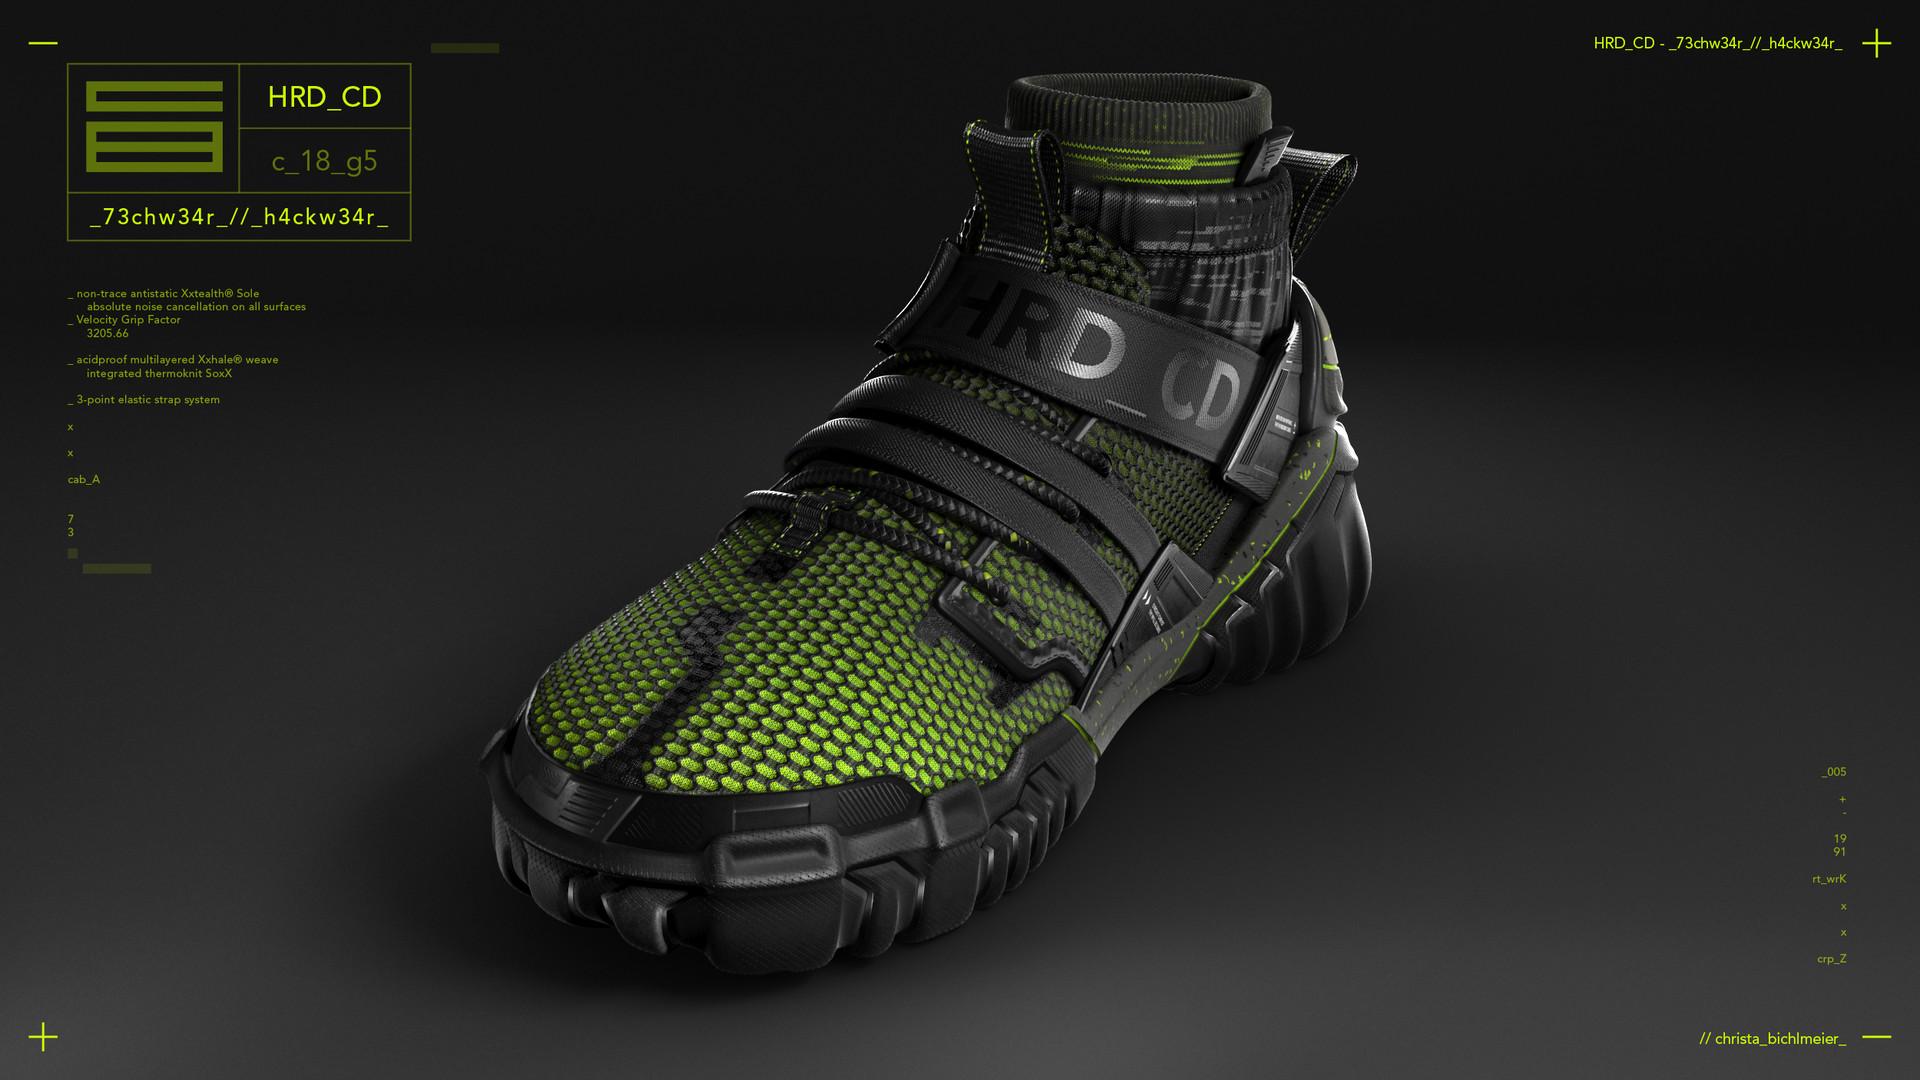 christa-bichlmeier-christa-bichlmeier-techwear-hackwear-shoes-beauty-cam-02 - Copy.jpg